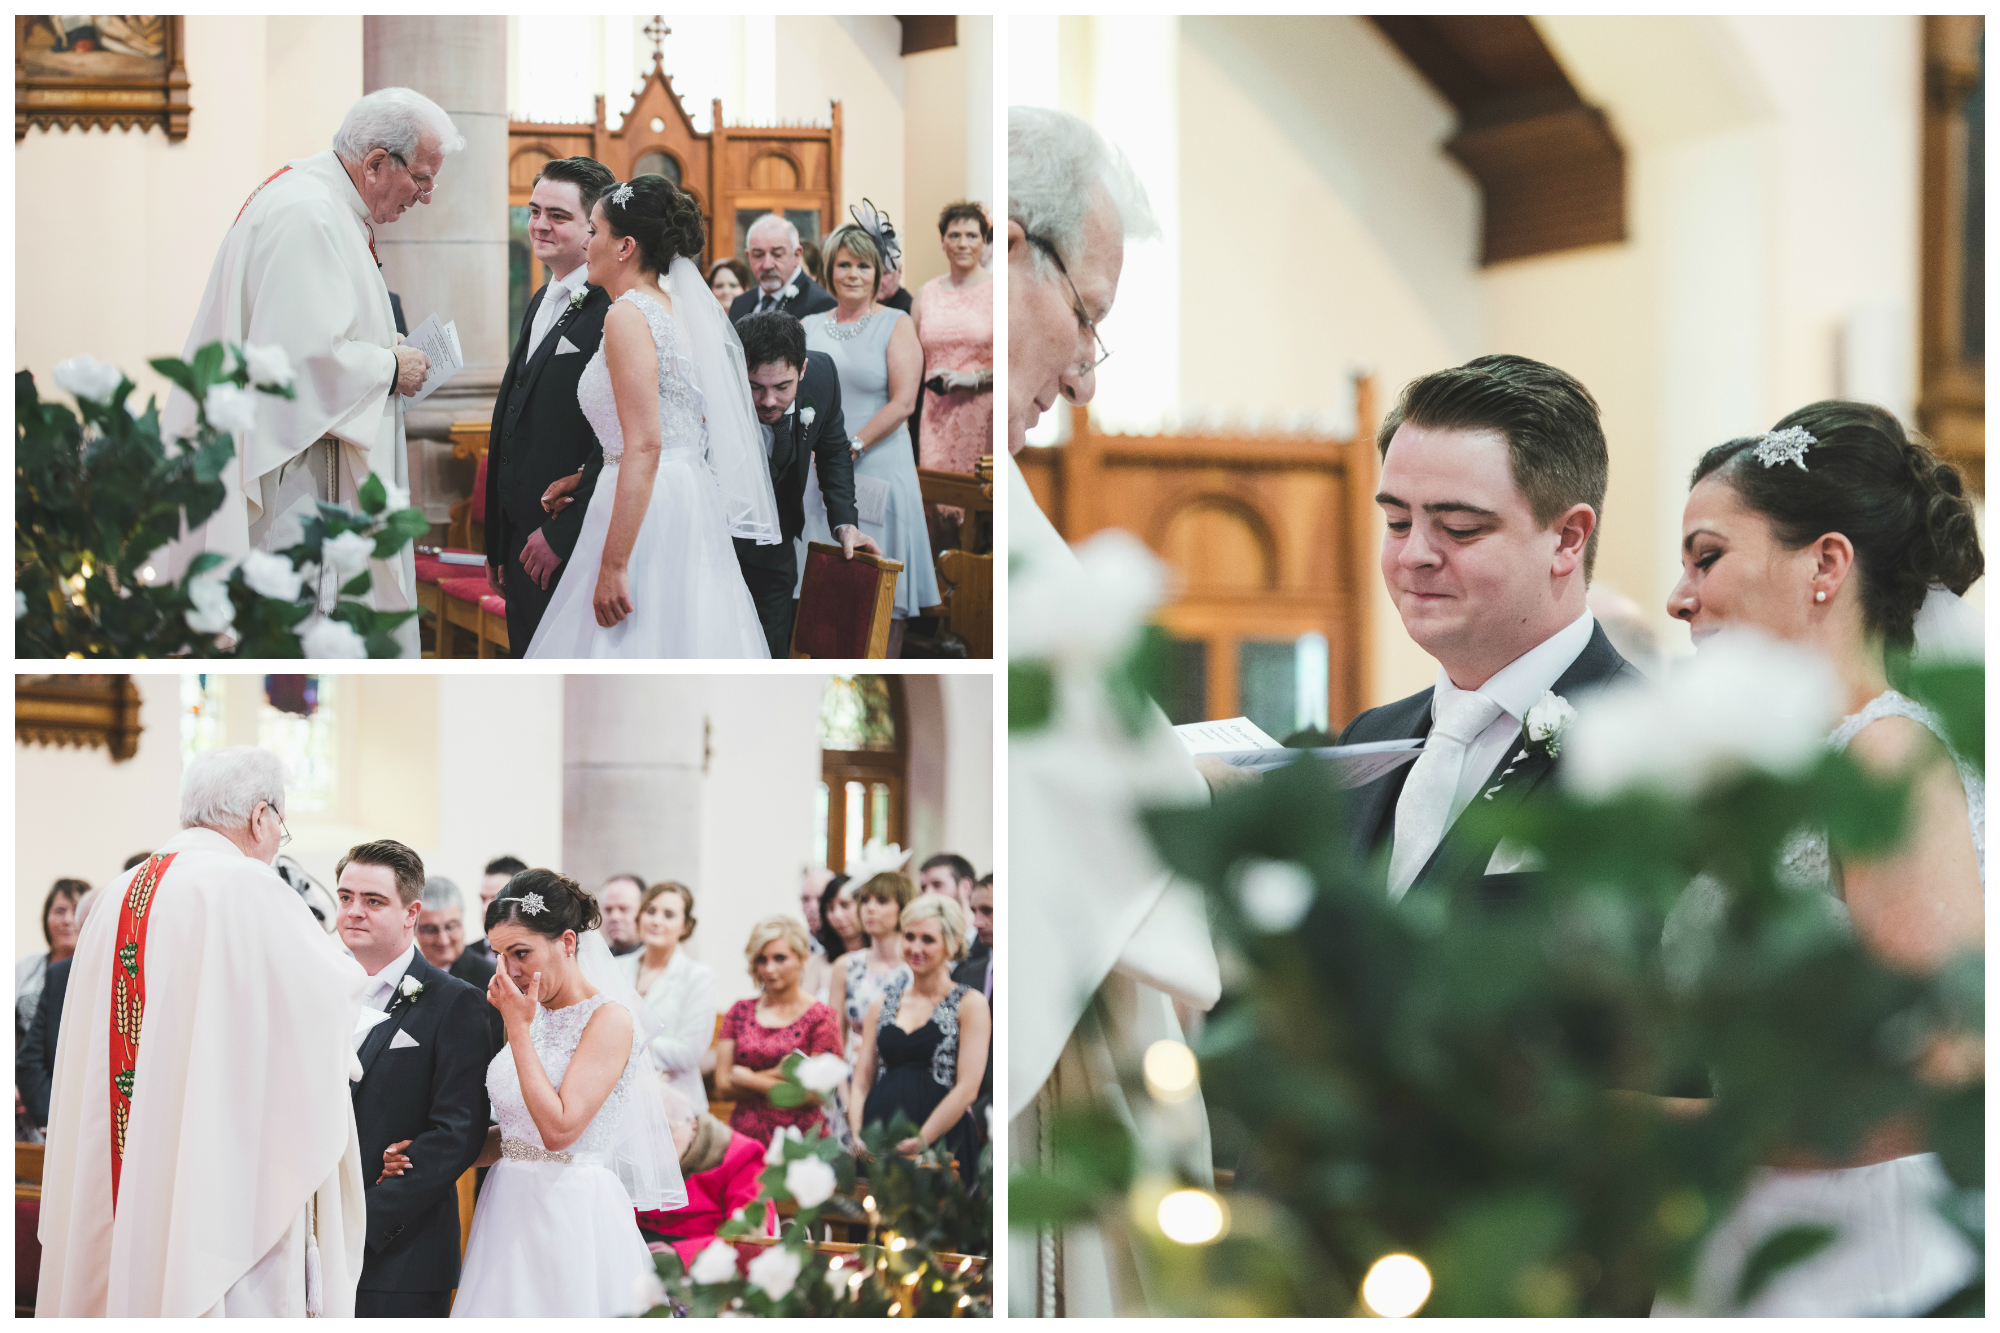 Northern_Ireland_Wedding_Photography_St_Patricks_Lisburn_Bride_Ceremony_Groom_Priest.jpg